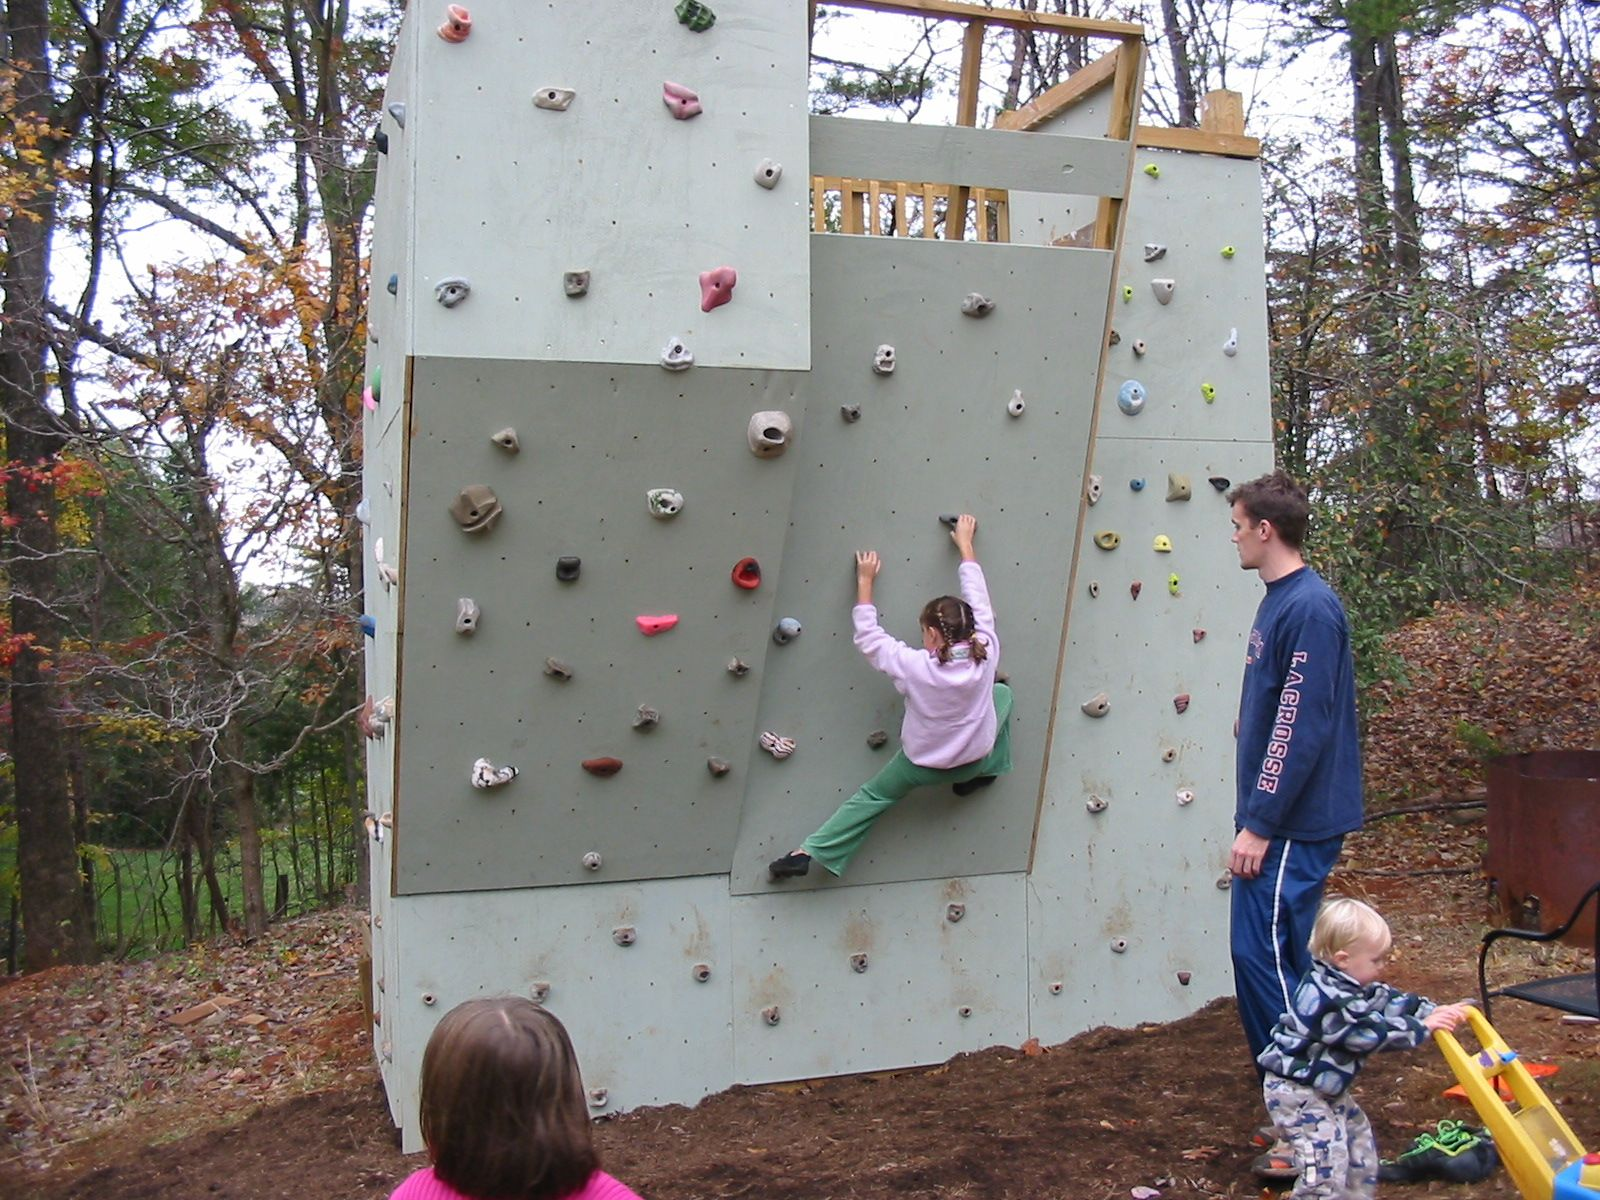 backyard climbing wall - Google Search | Treeforts and ...